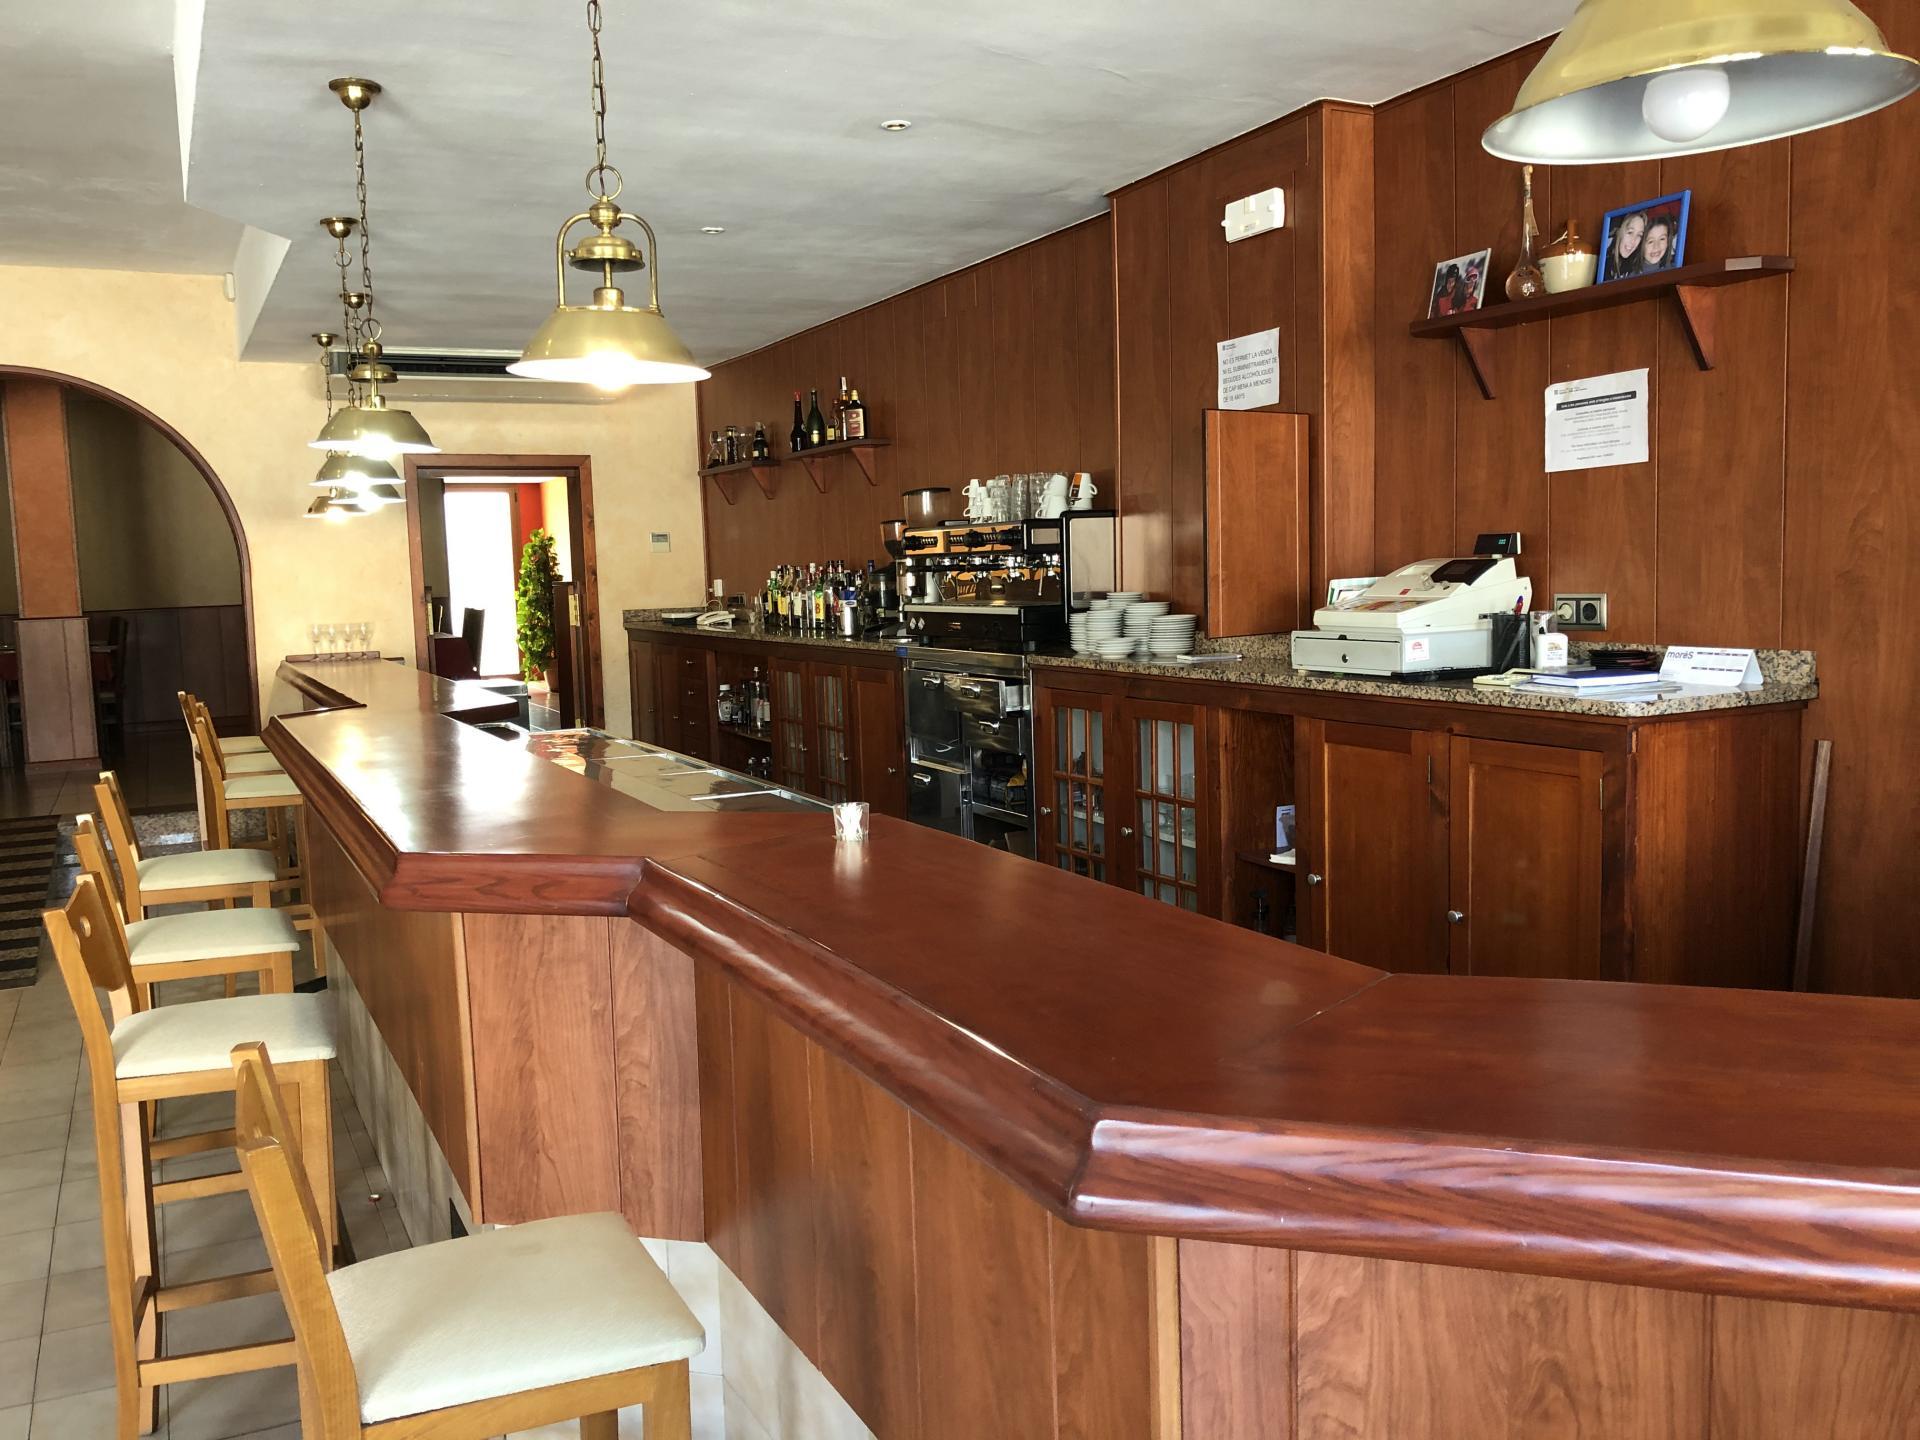 Foto 17 (V-735-2021) - Inmueble en  Venda a Santa Margarida i els Monjos